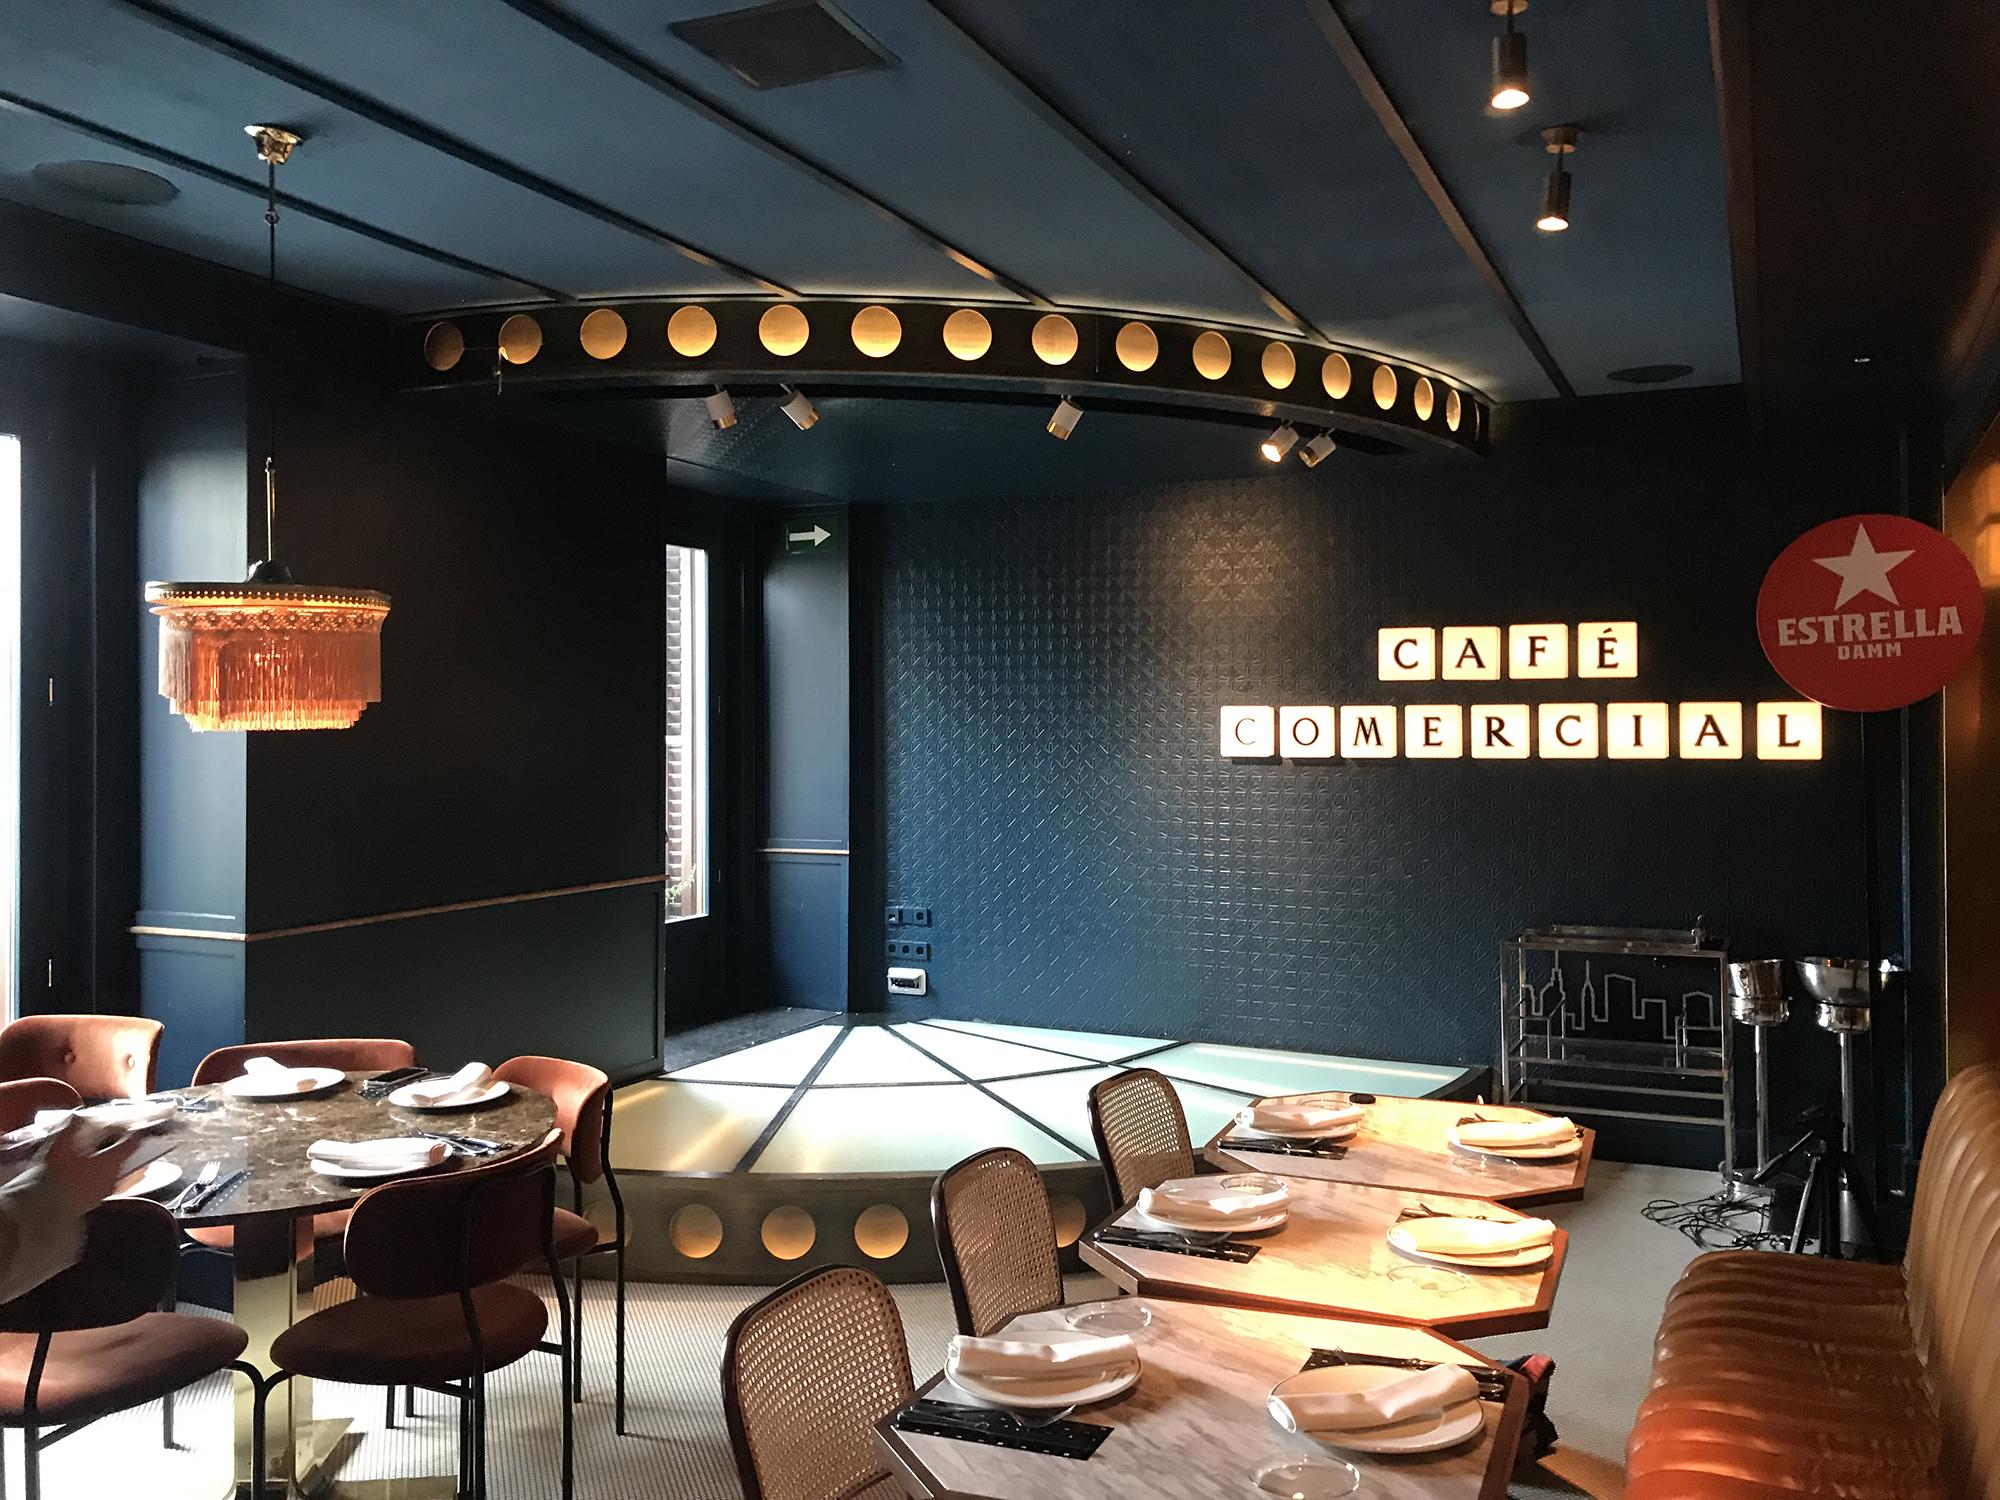 13-CAFE-COMERCIAL-3